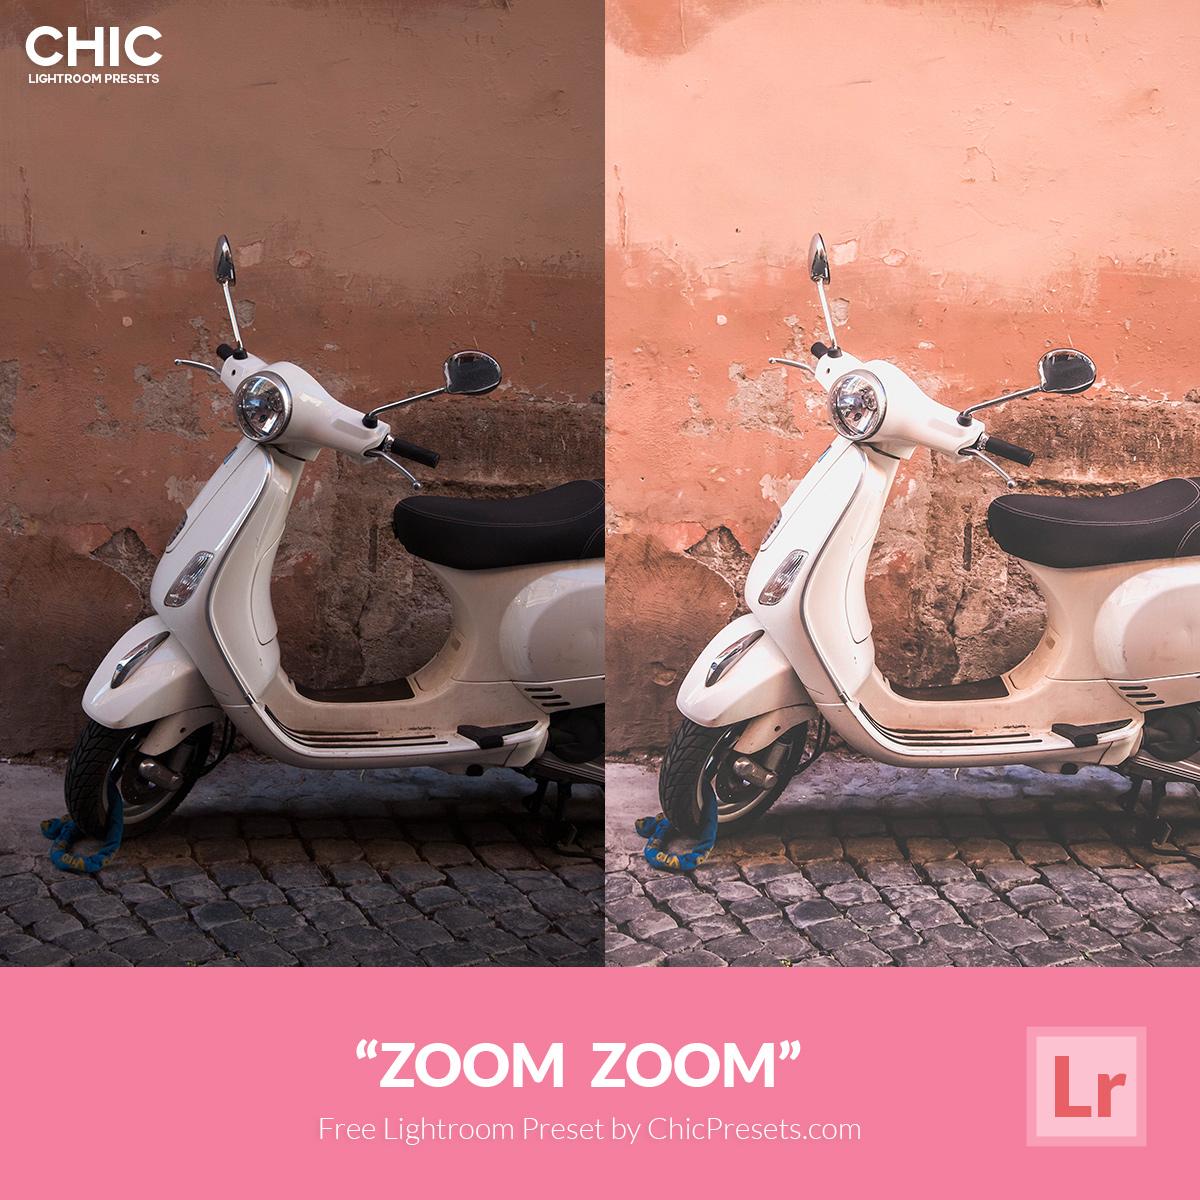 Free Lightroom Preset Zoom Zoom